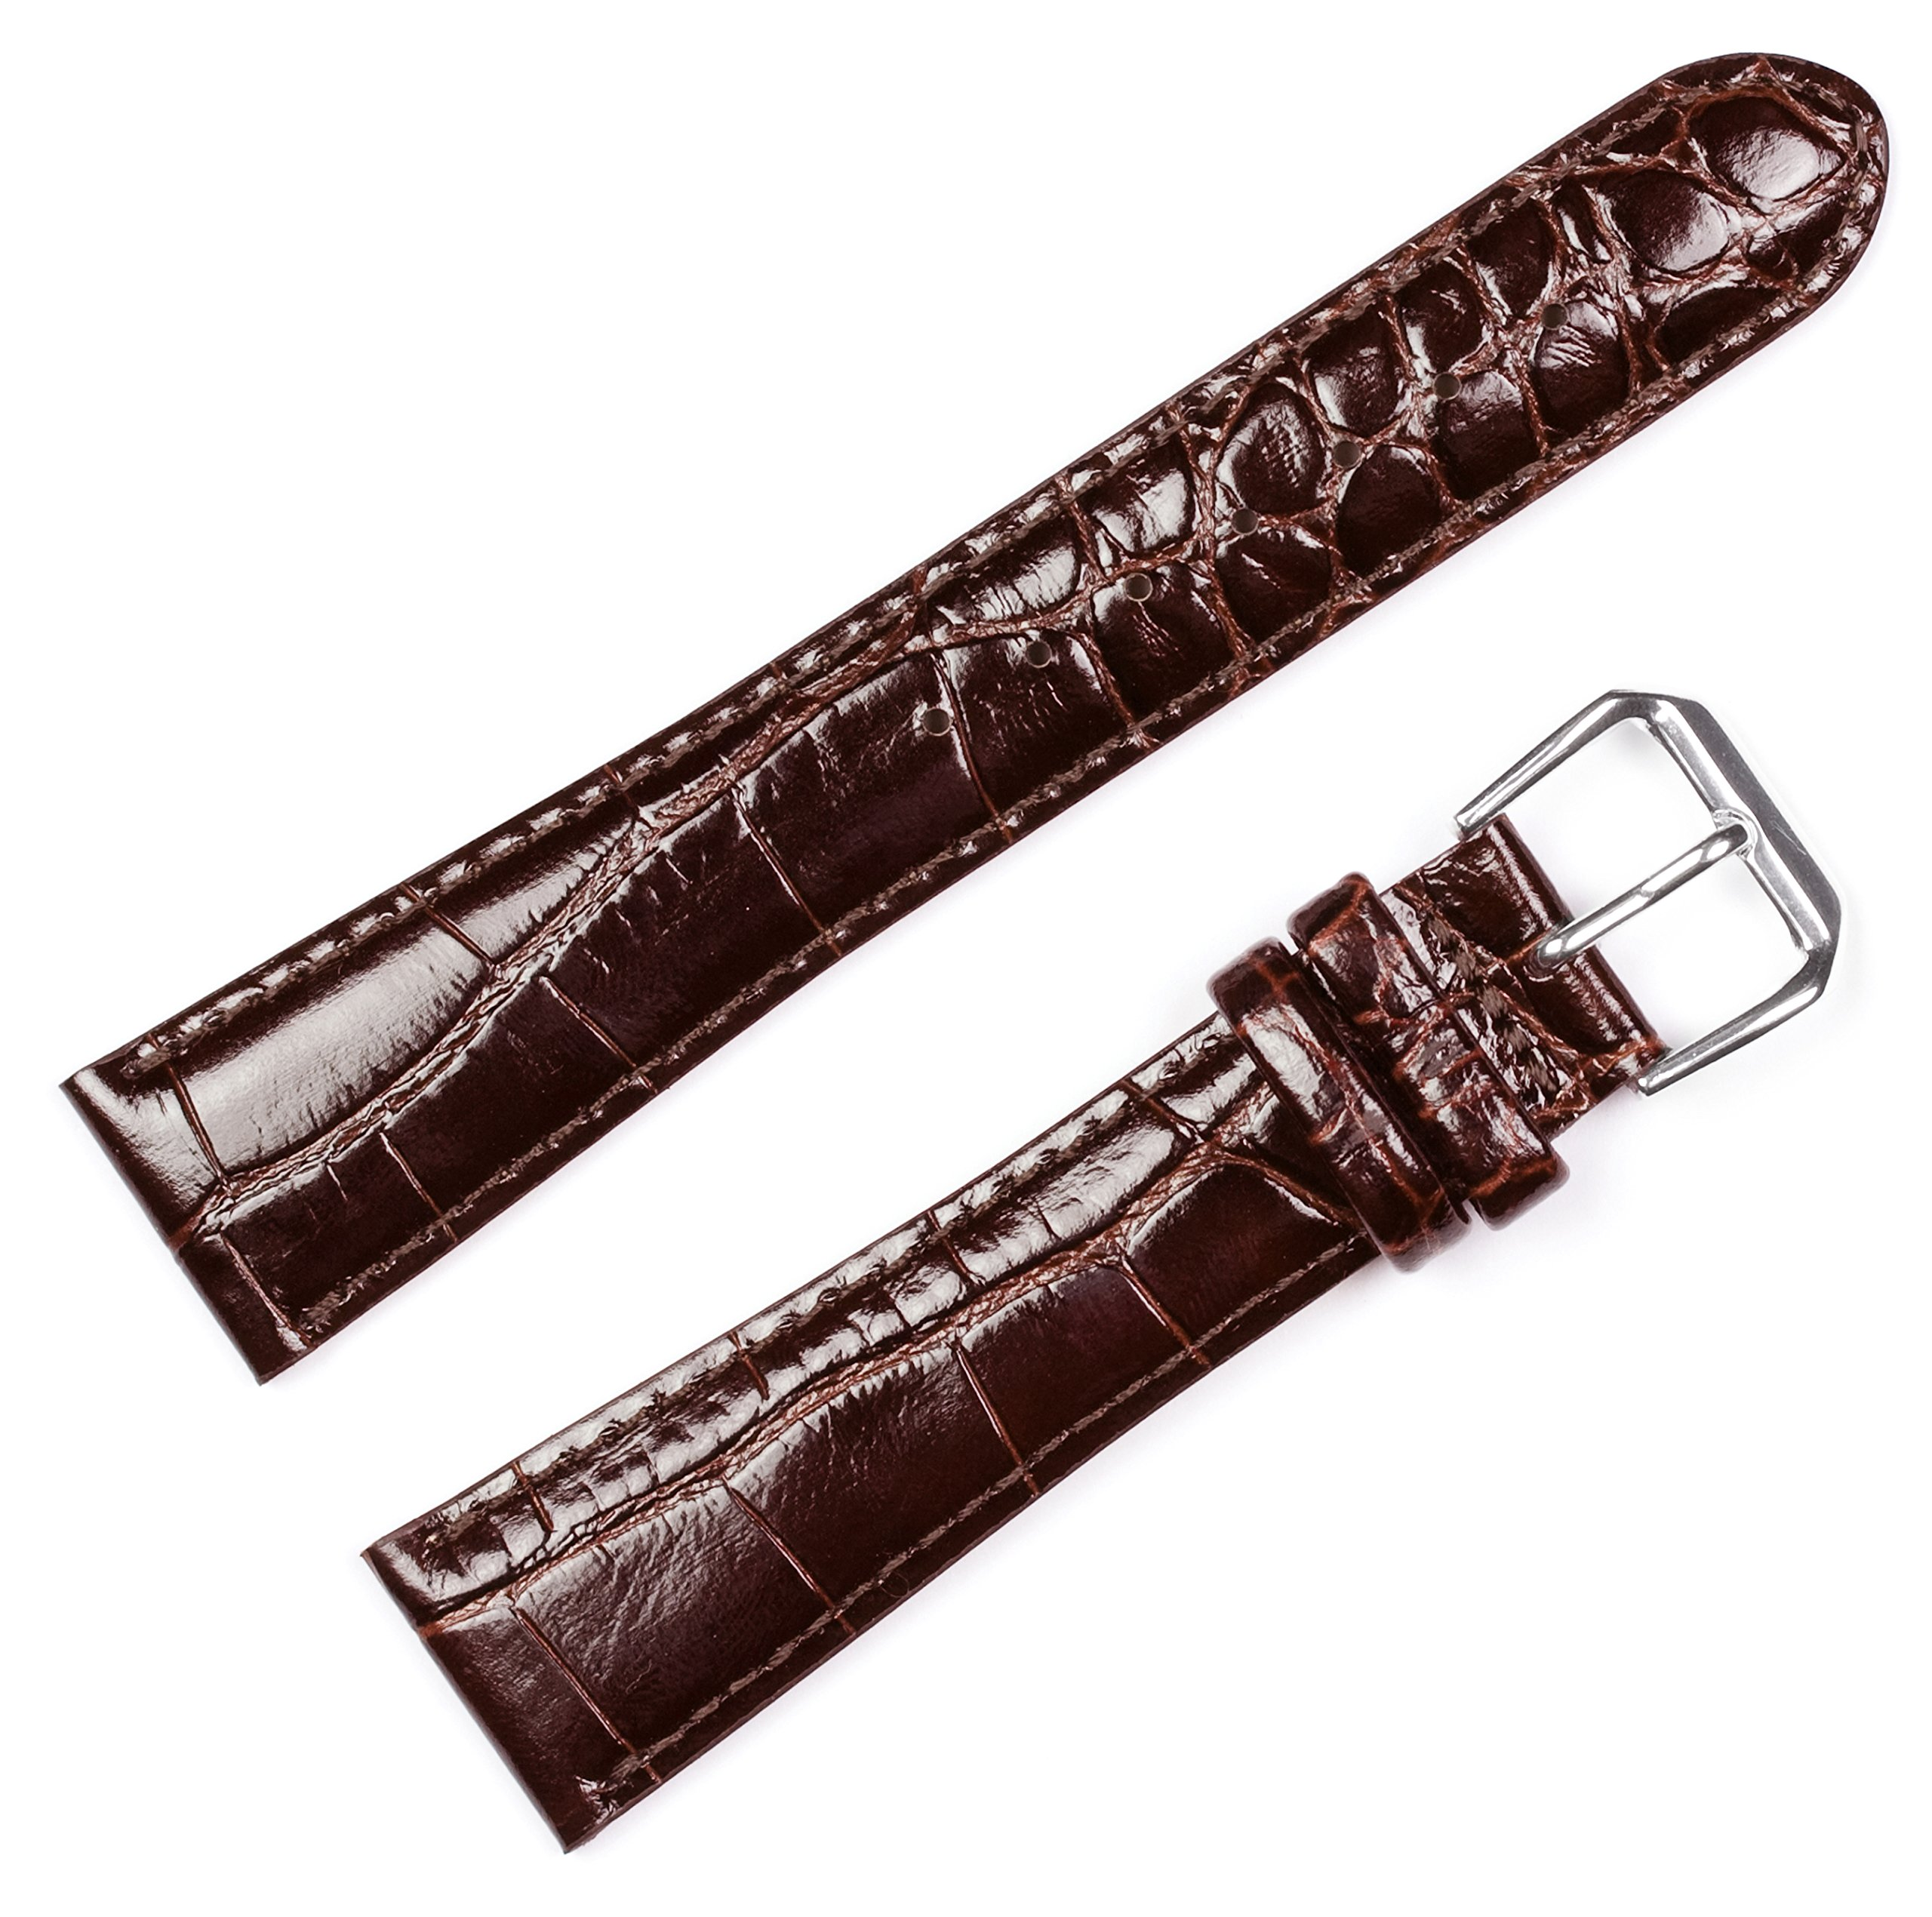 Crocodile Grain Watchband - Brown 10MM